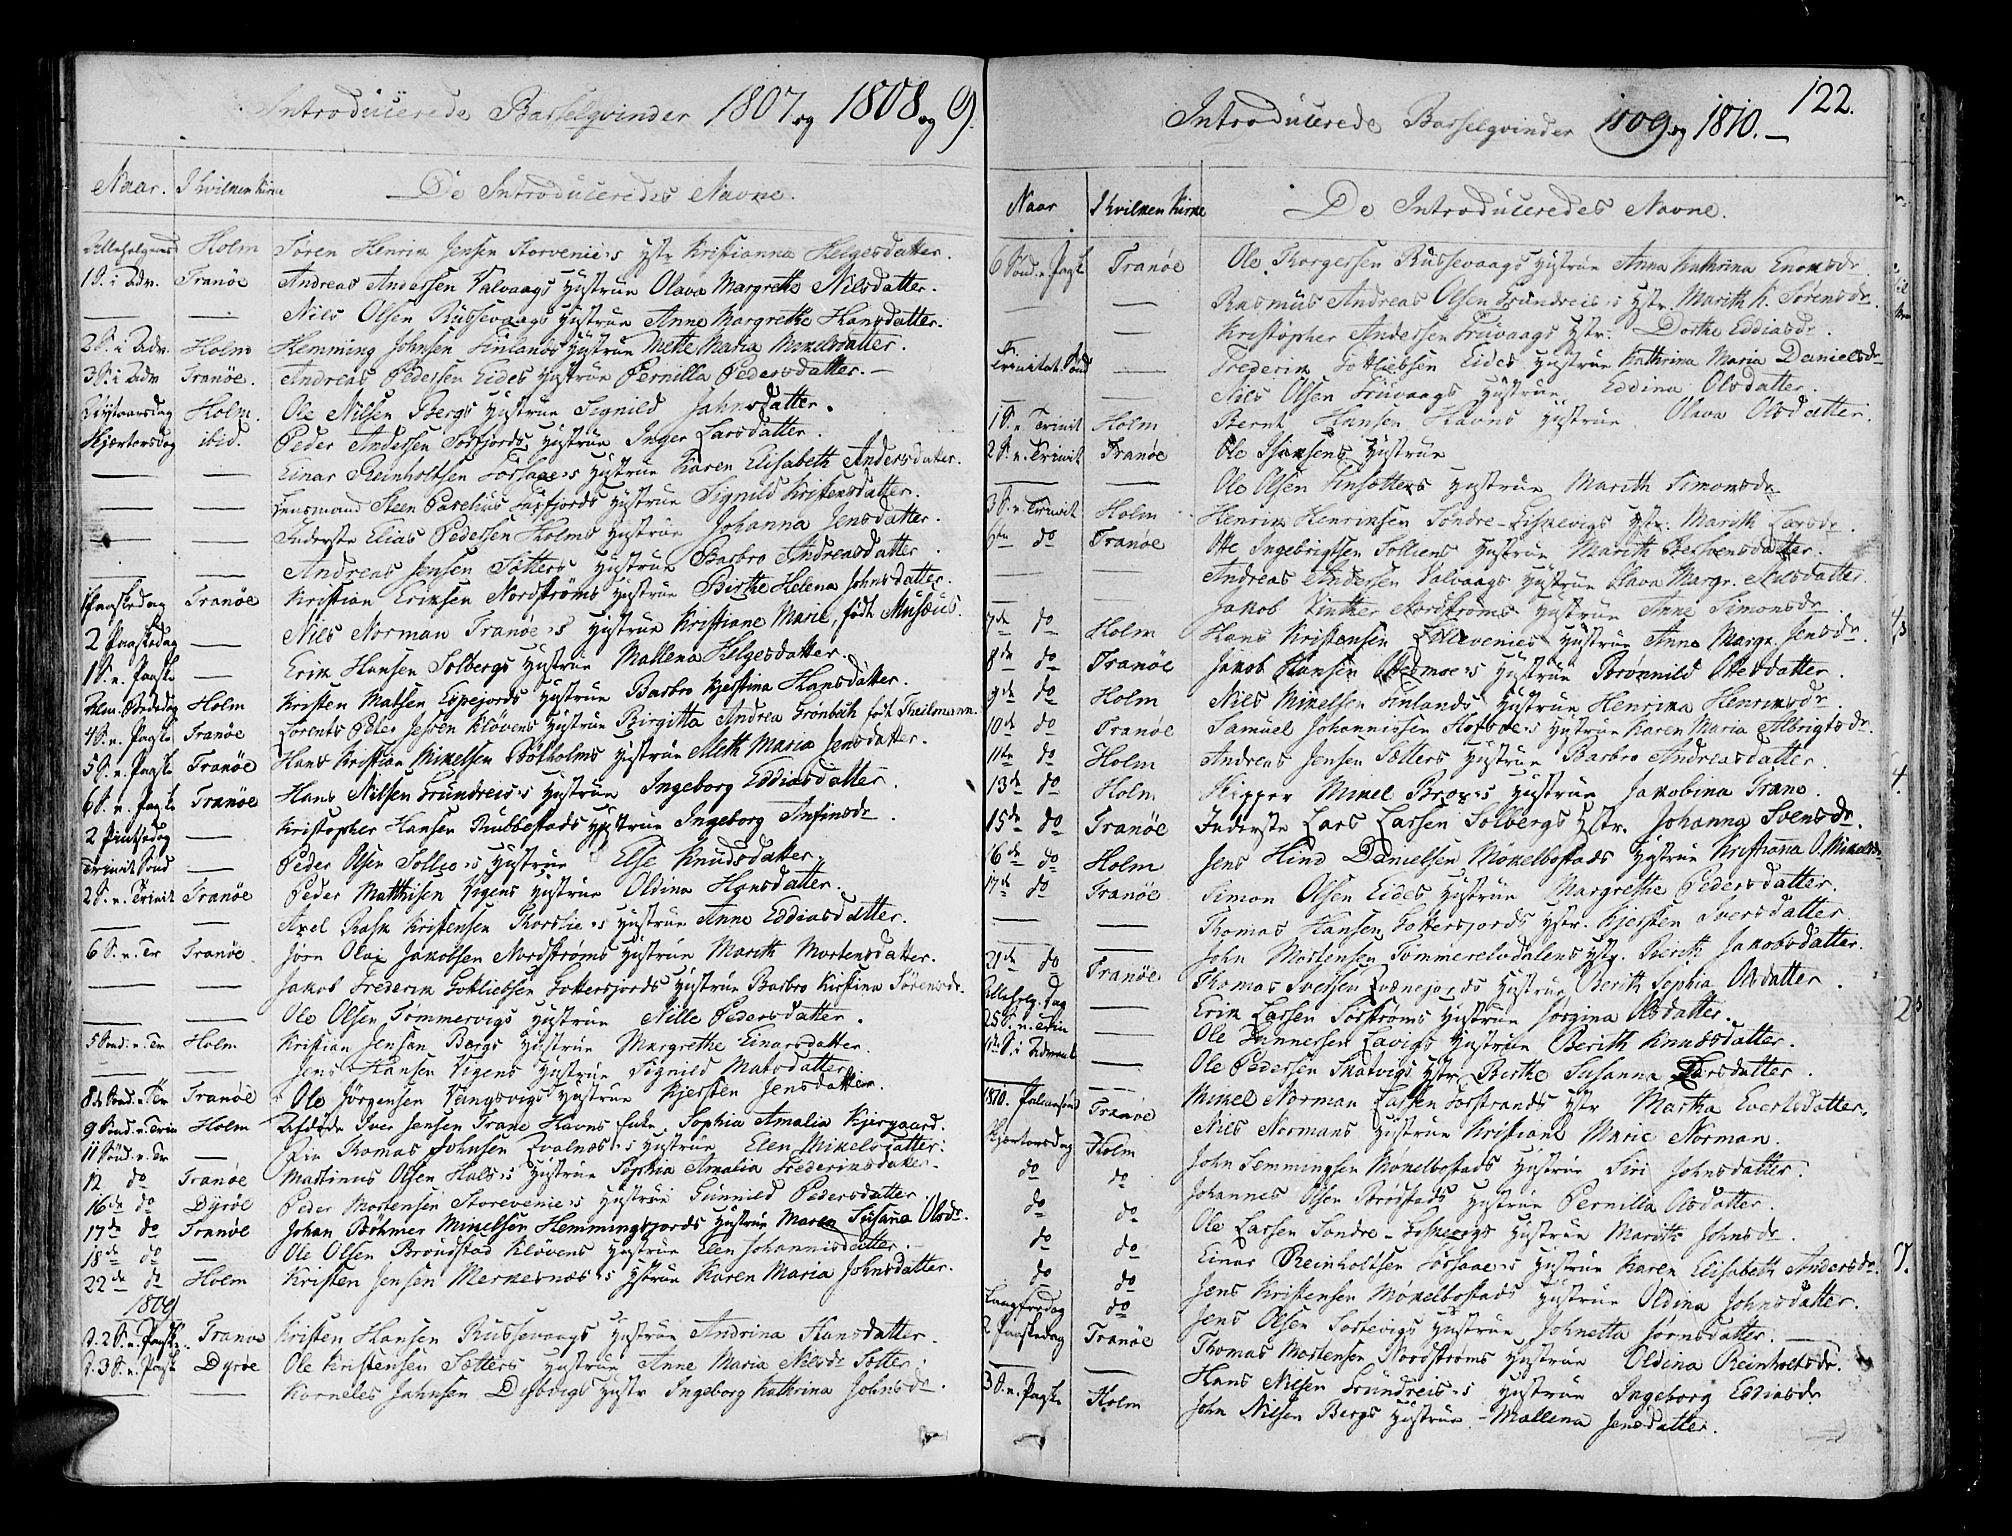 SATØ, Tranøy sokneprestkontor, I/Ia/Iaa/L0003kirke: Ministerialbok nr. 3, 1807-1820, s. 122